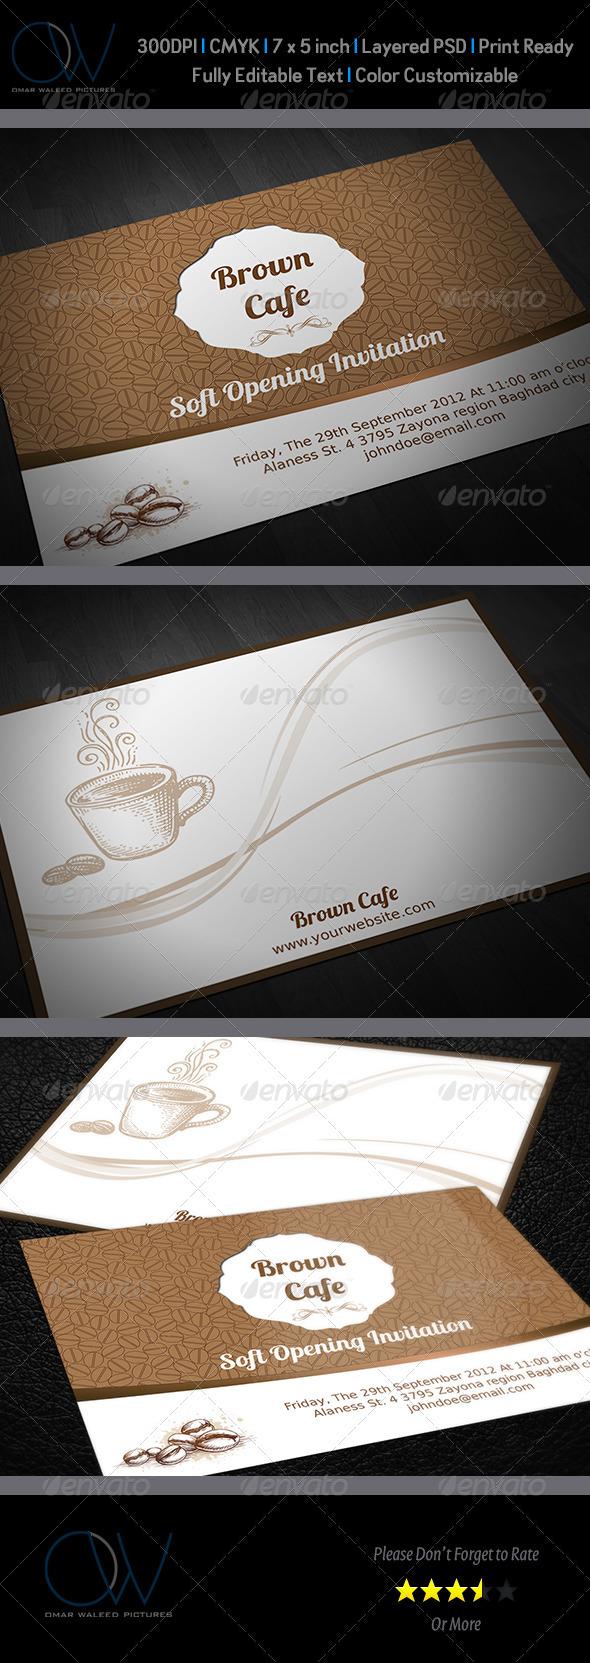 Cafe Invitation Card - Invitations Cards & Invites